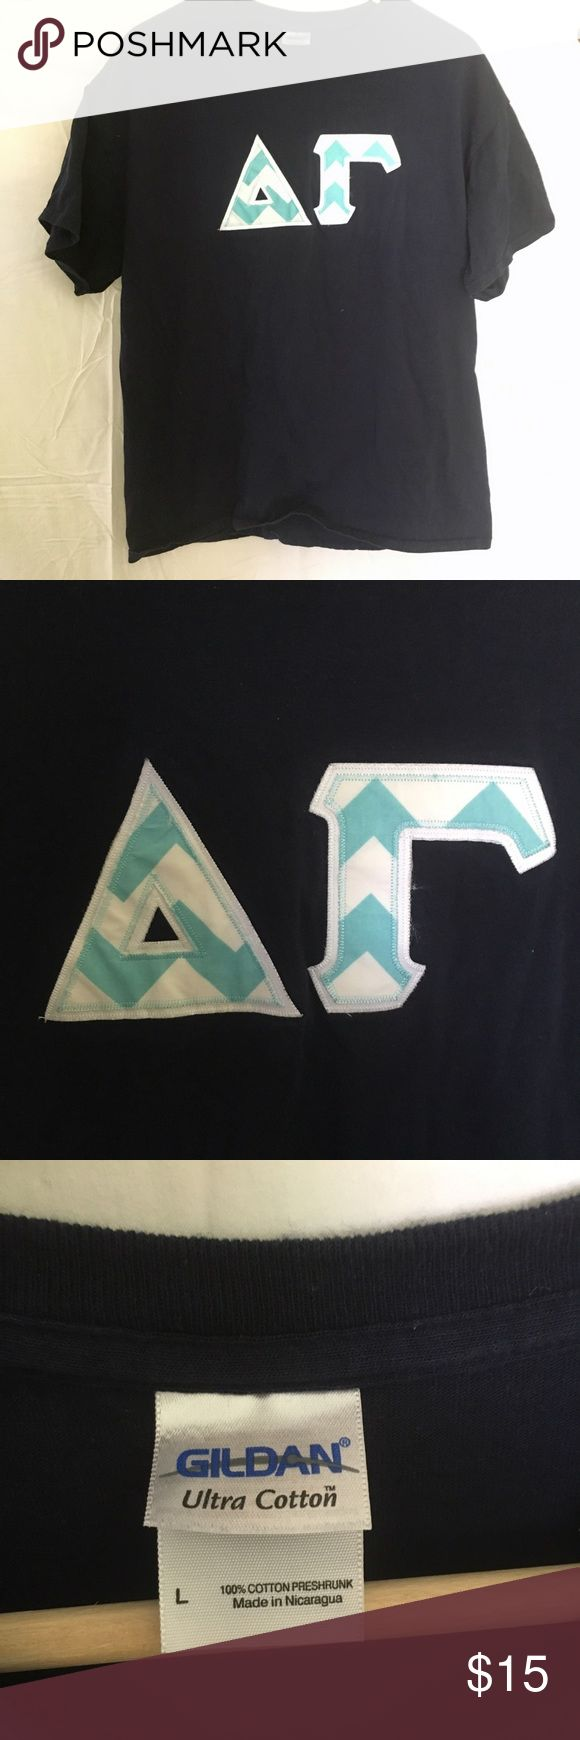 Delta Gamma DG embroidered Cotton navy t-shirt Size large navy t-shirt embroidered with Greek letters.  Delta Gamma. Tops Tees - Short Sleeve